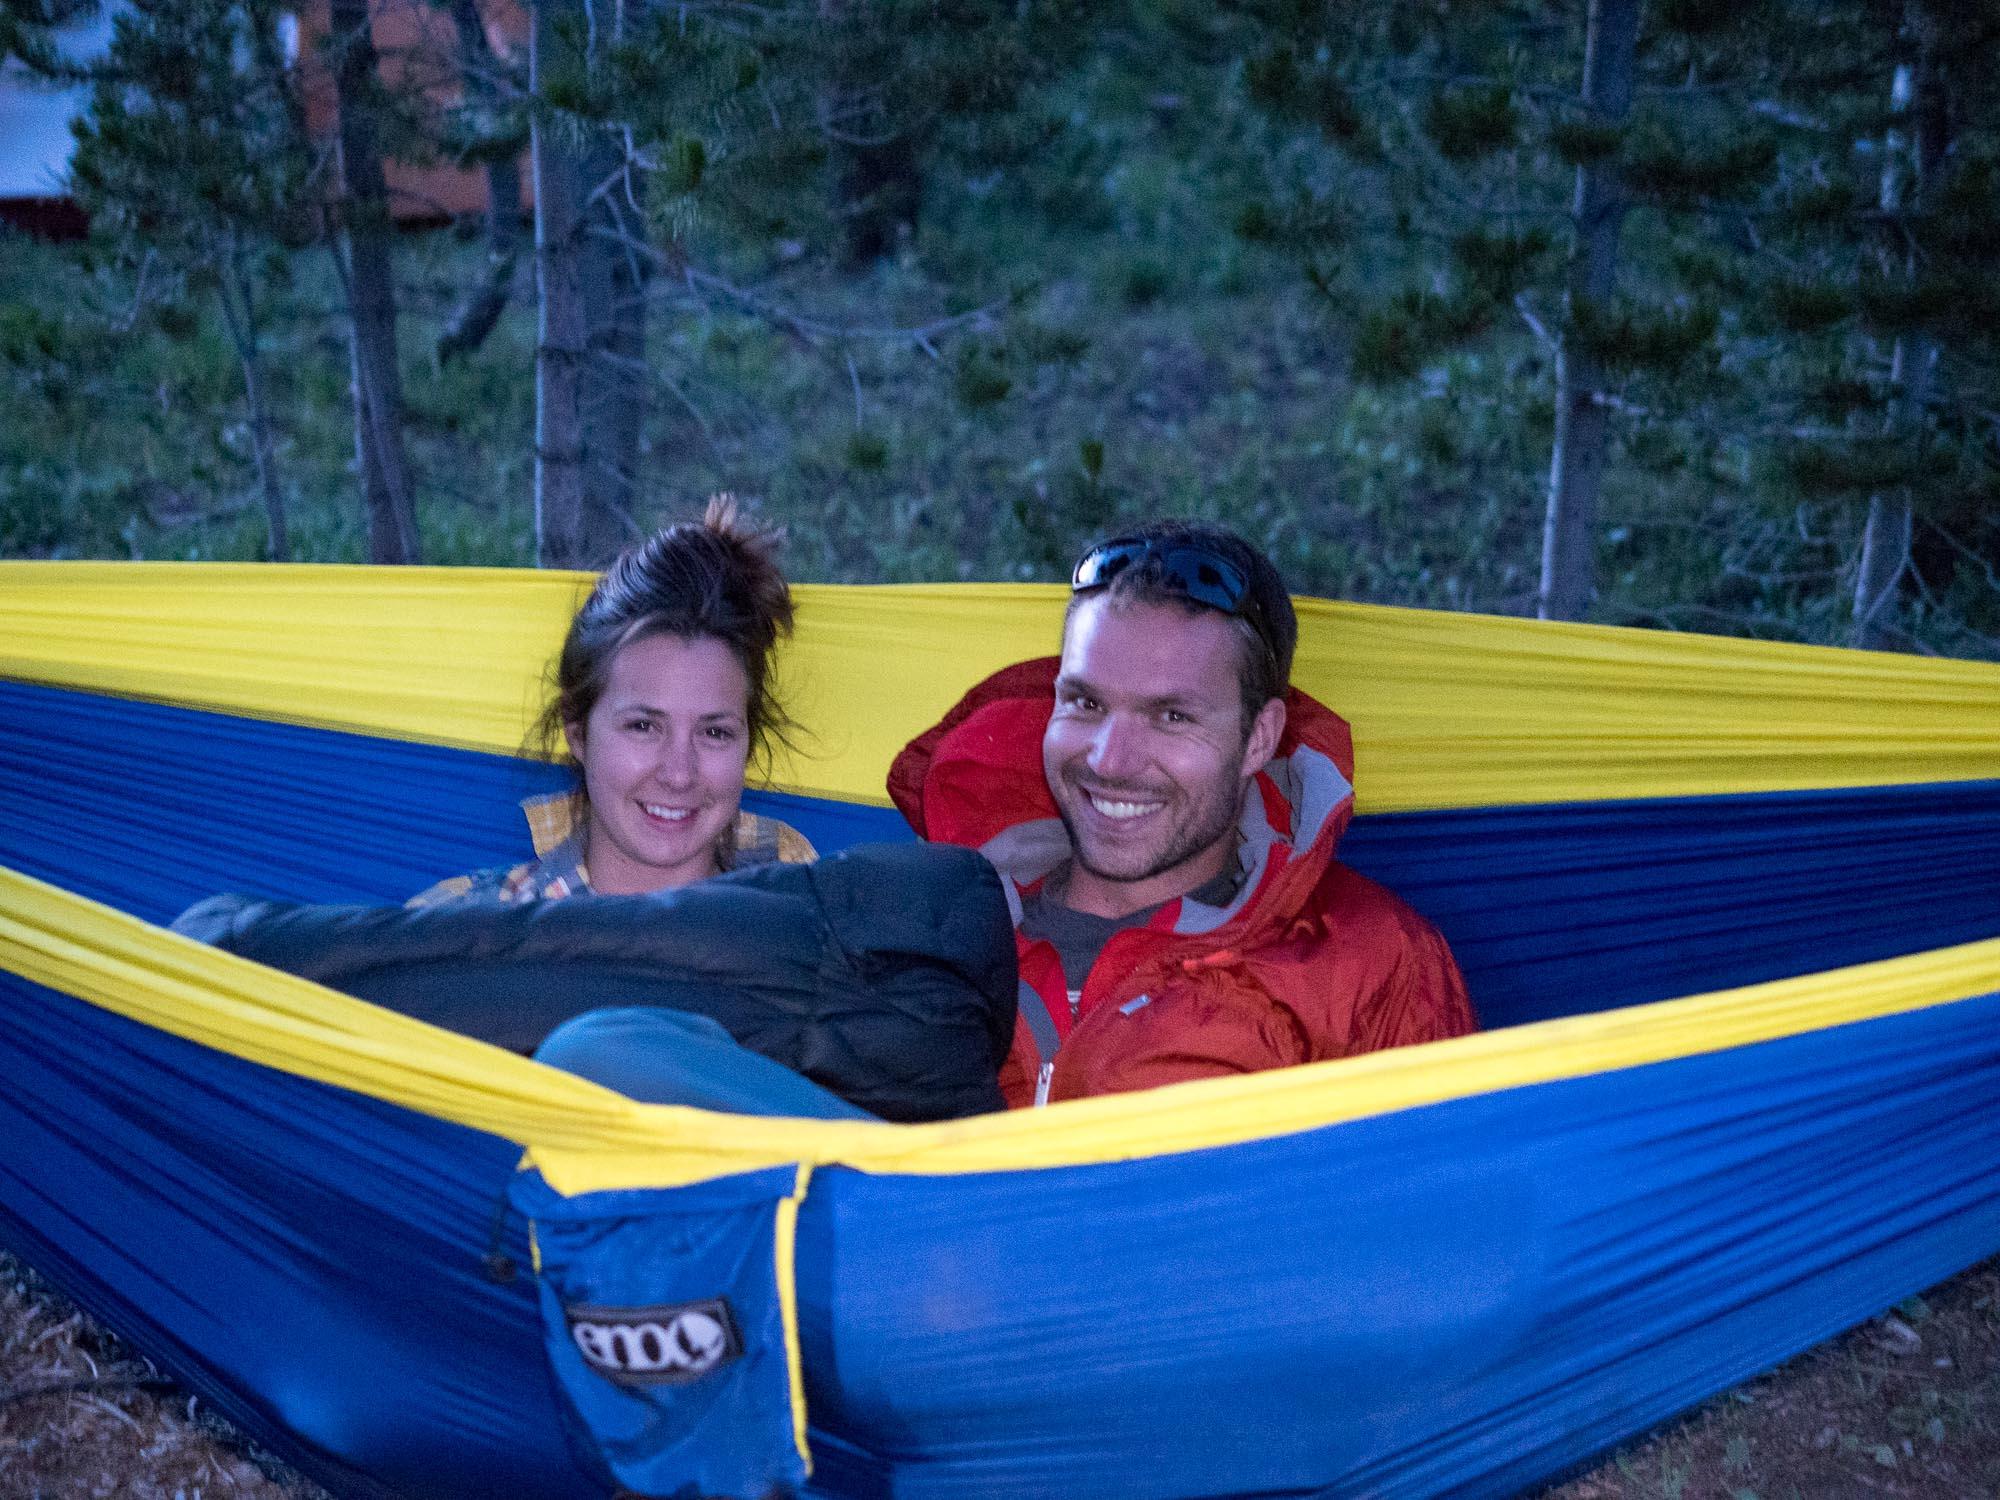 hammock snuggles